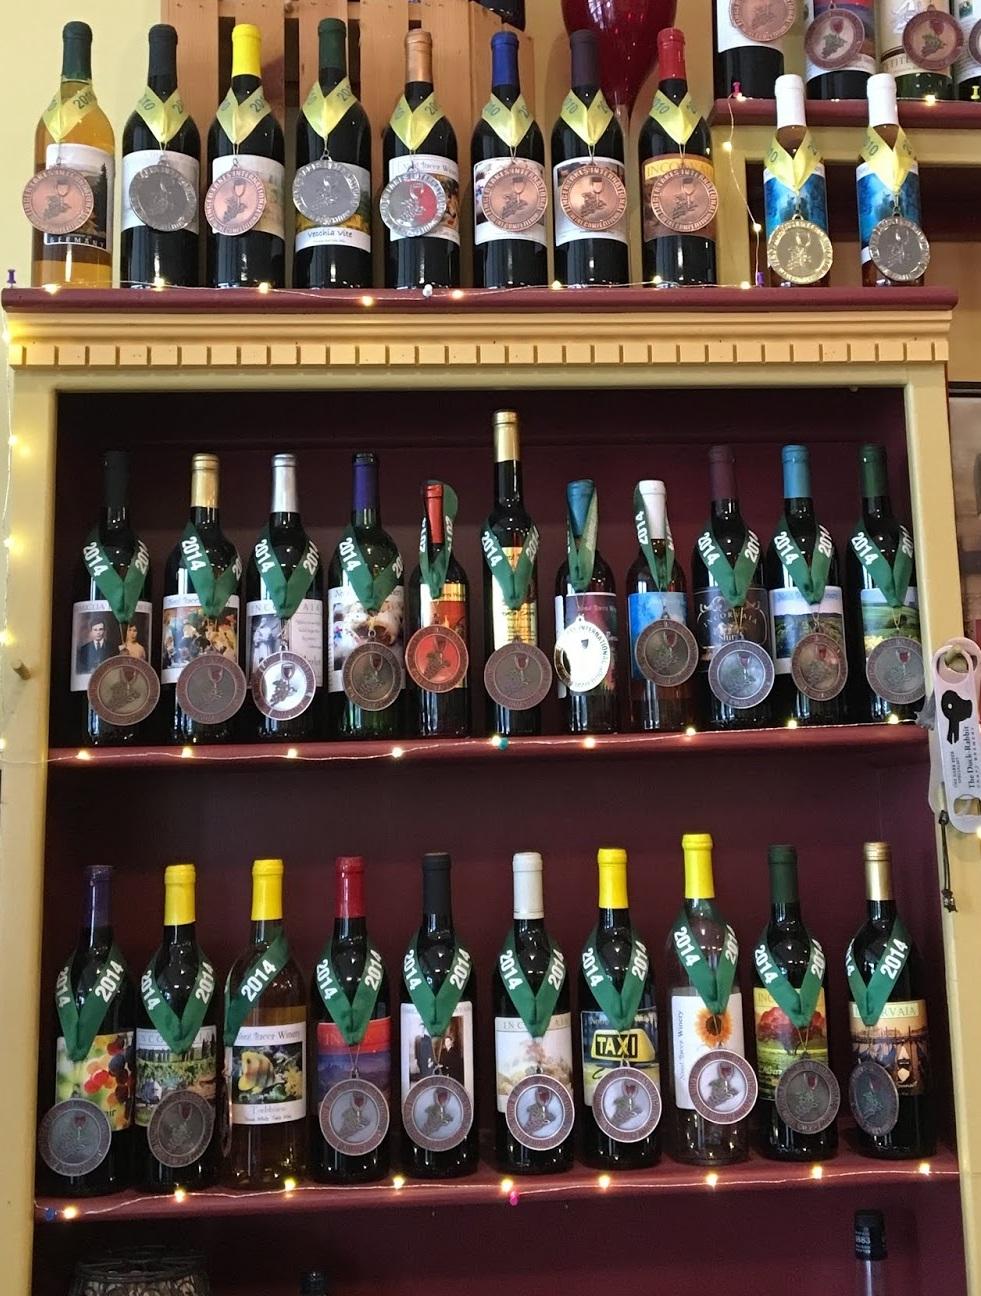 Noni+Bacca+Winery+Wilmington-3.jpg